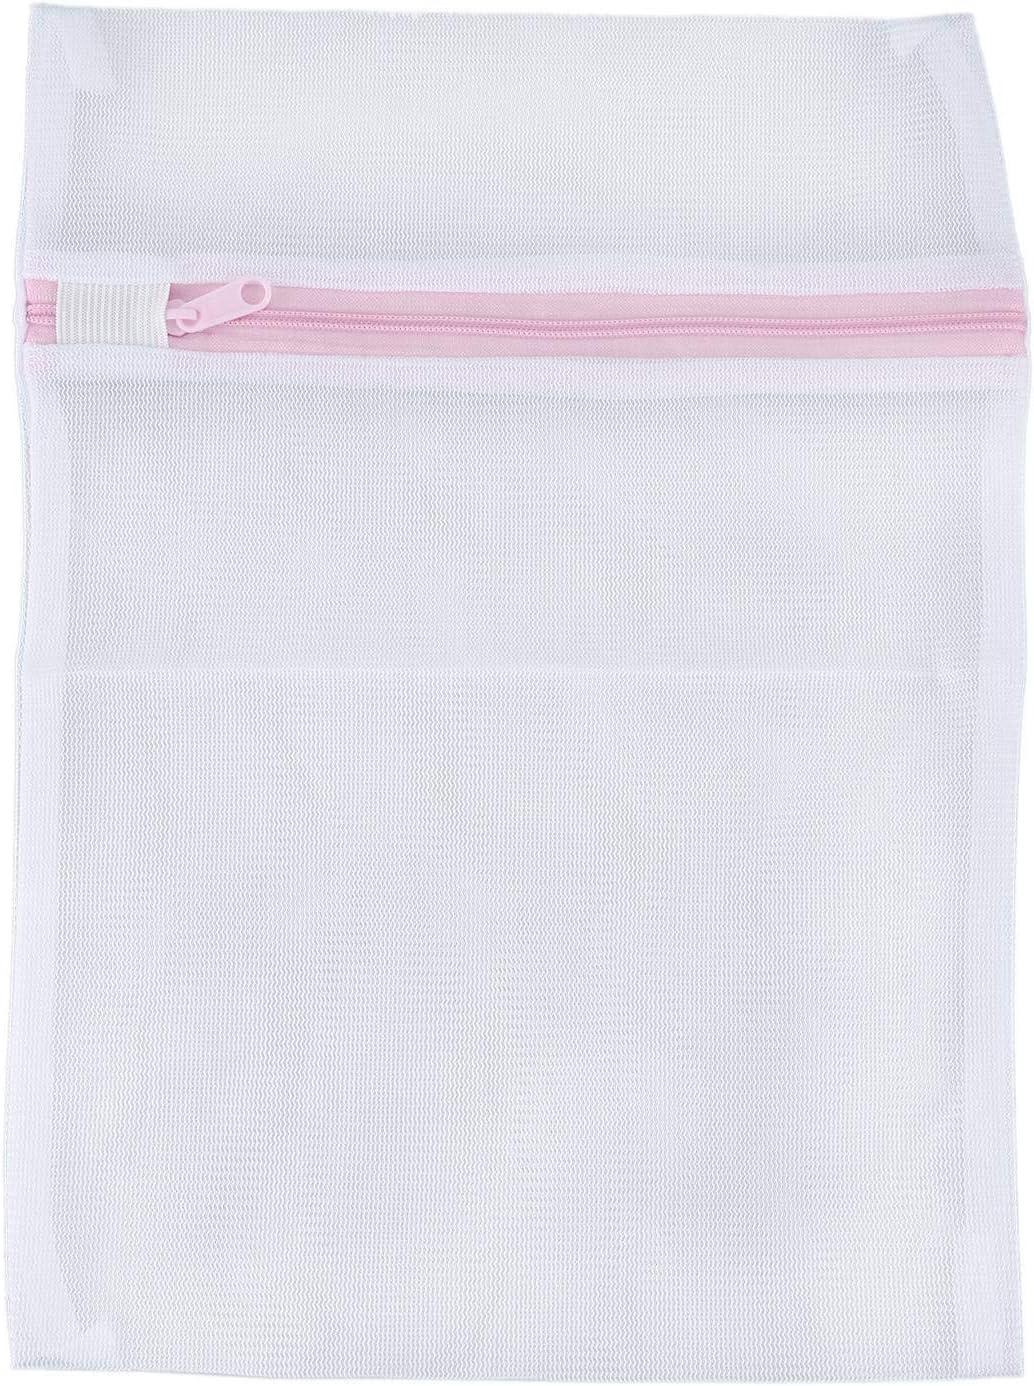 Gaetooely Bolsa de Lavadora de lavanderia de Ropa Interior Bra Calcetines de Lenceria de Red de Malla 23cm x 30cm